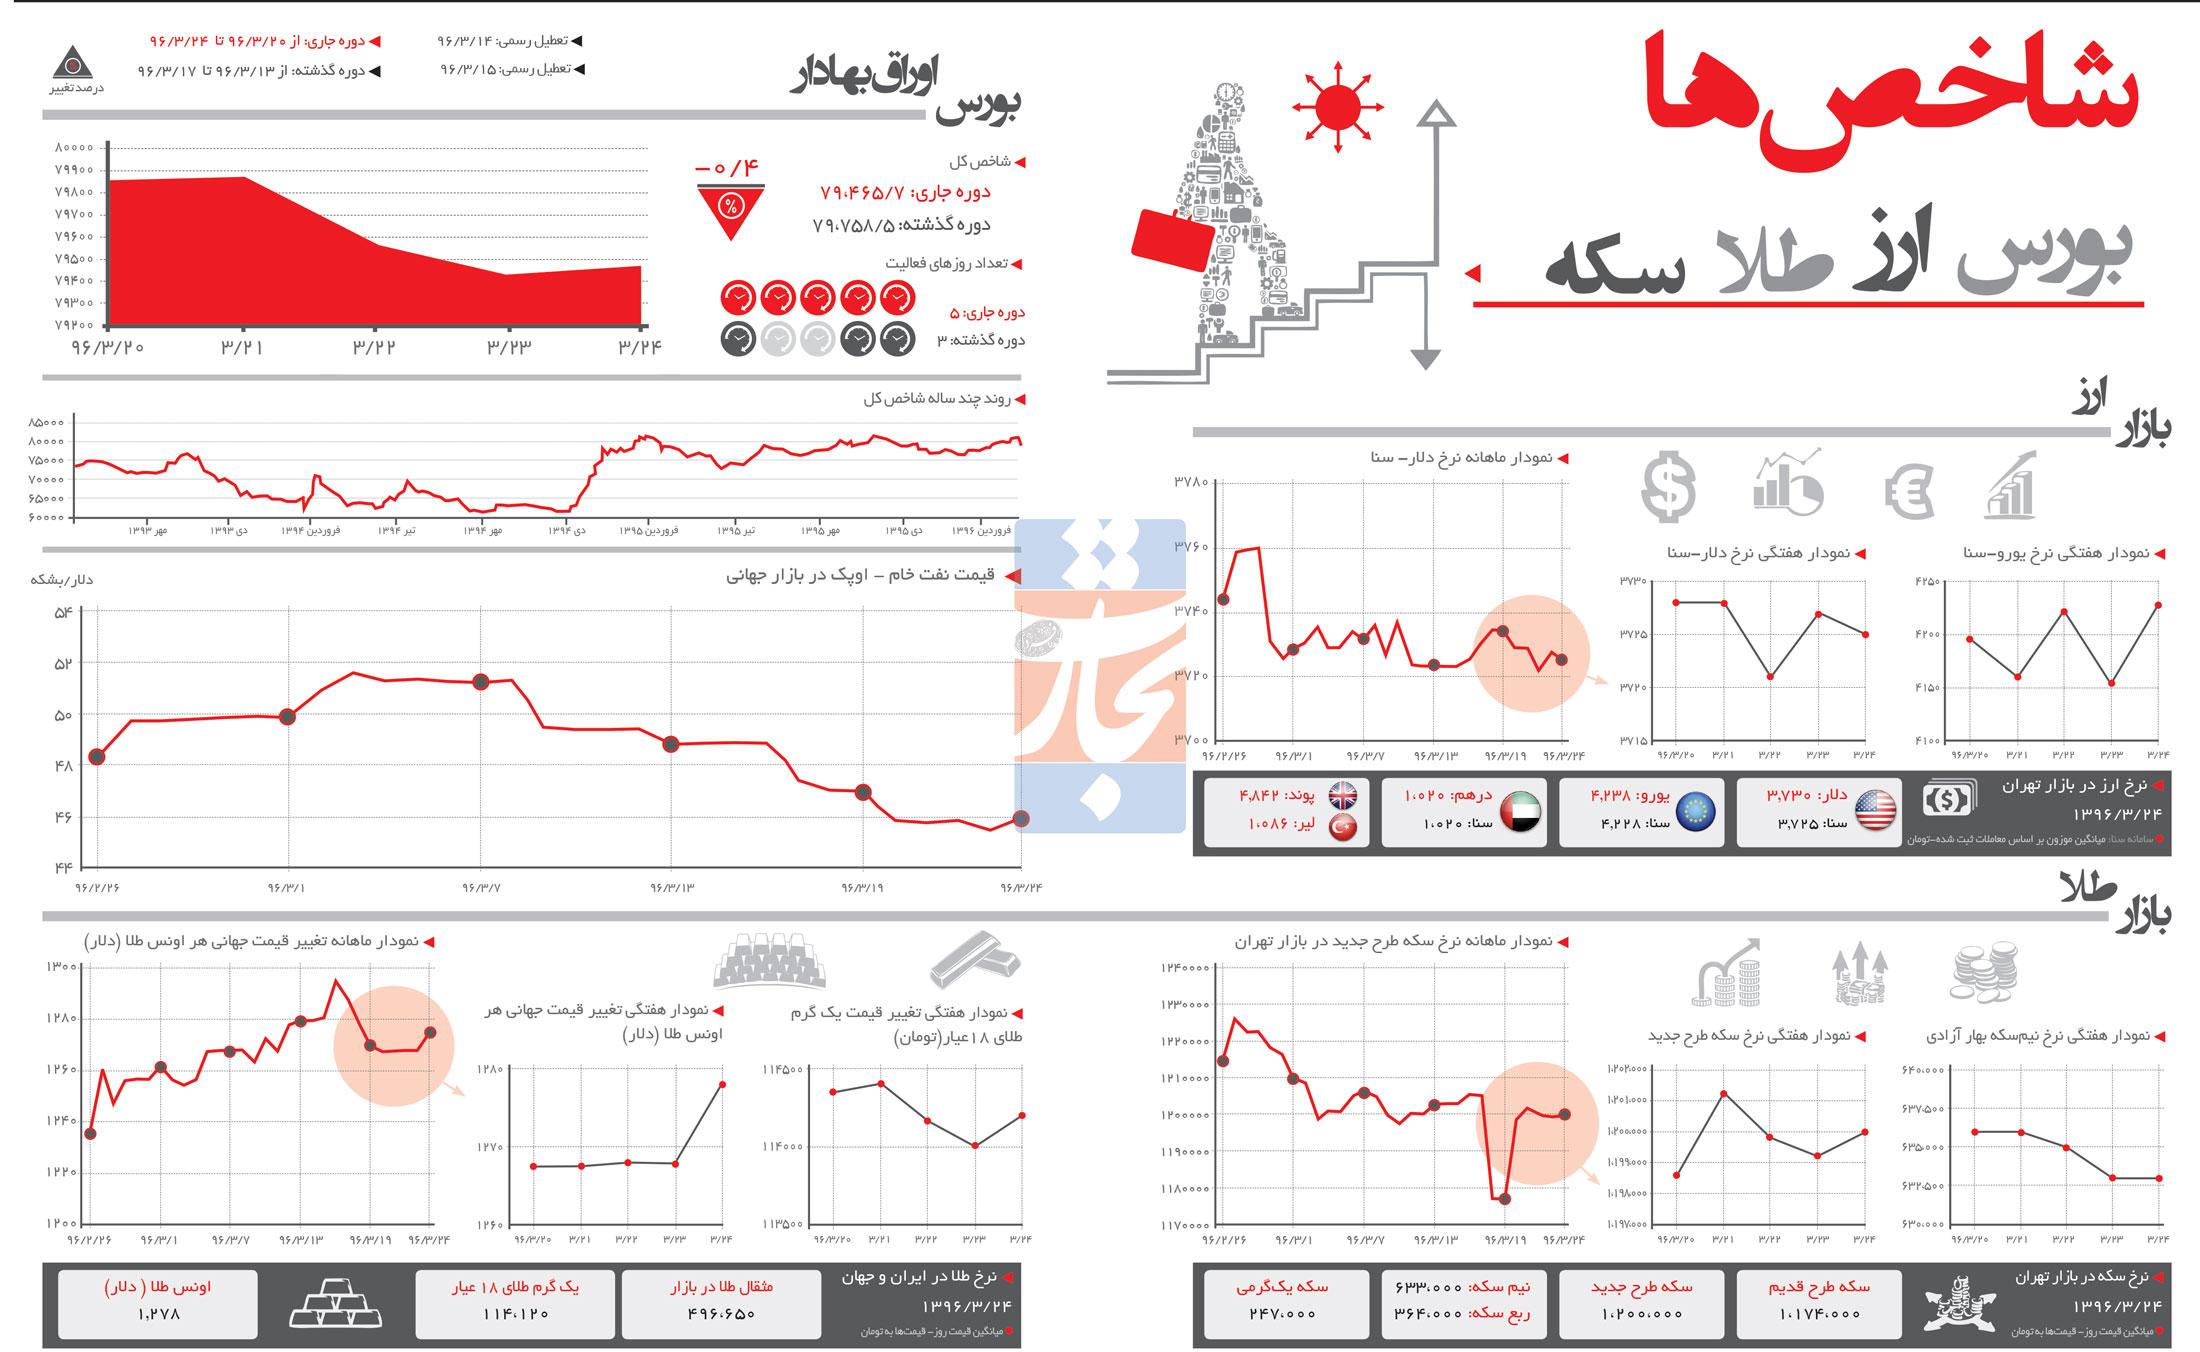 تجارت فردا- اینفوگرافیک- شاخص اقتصادی